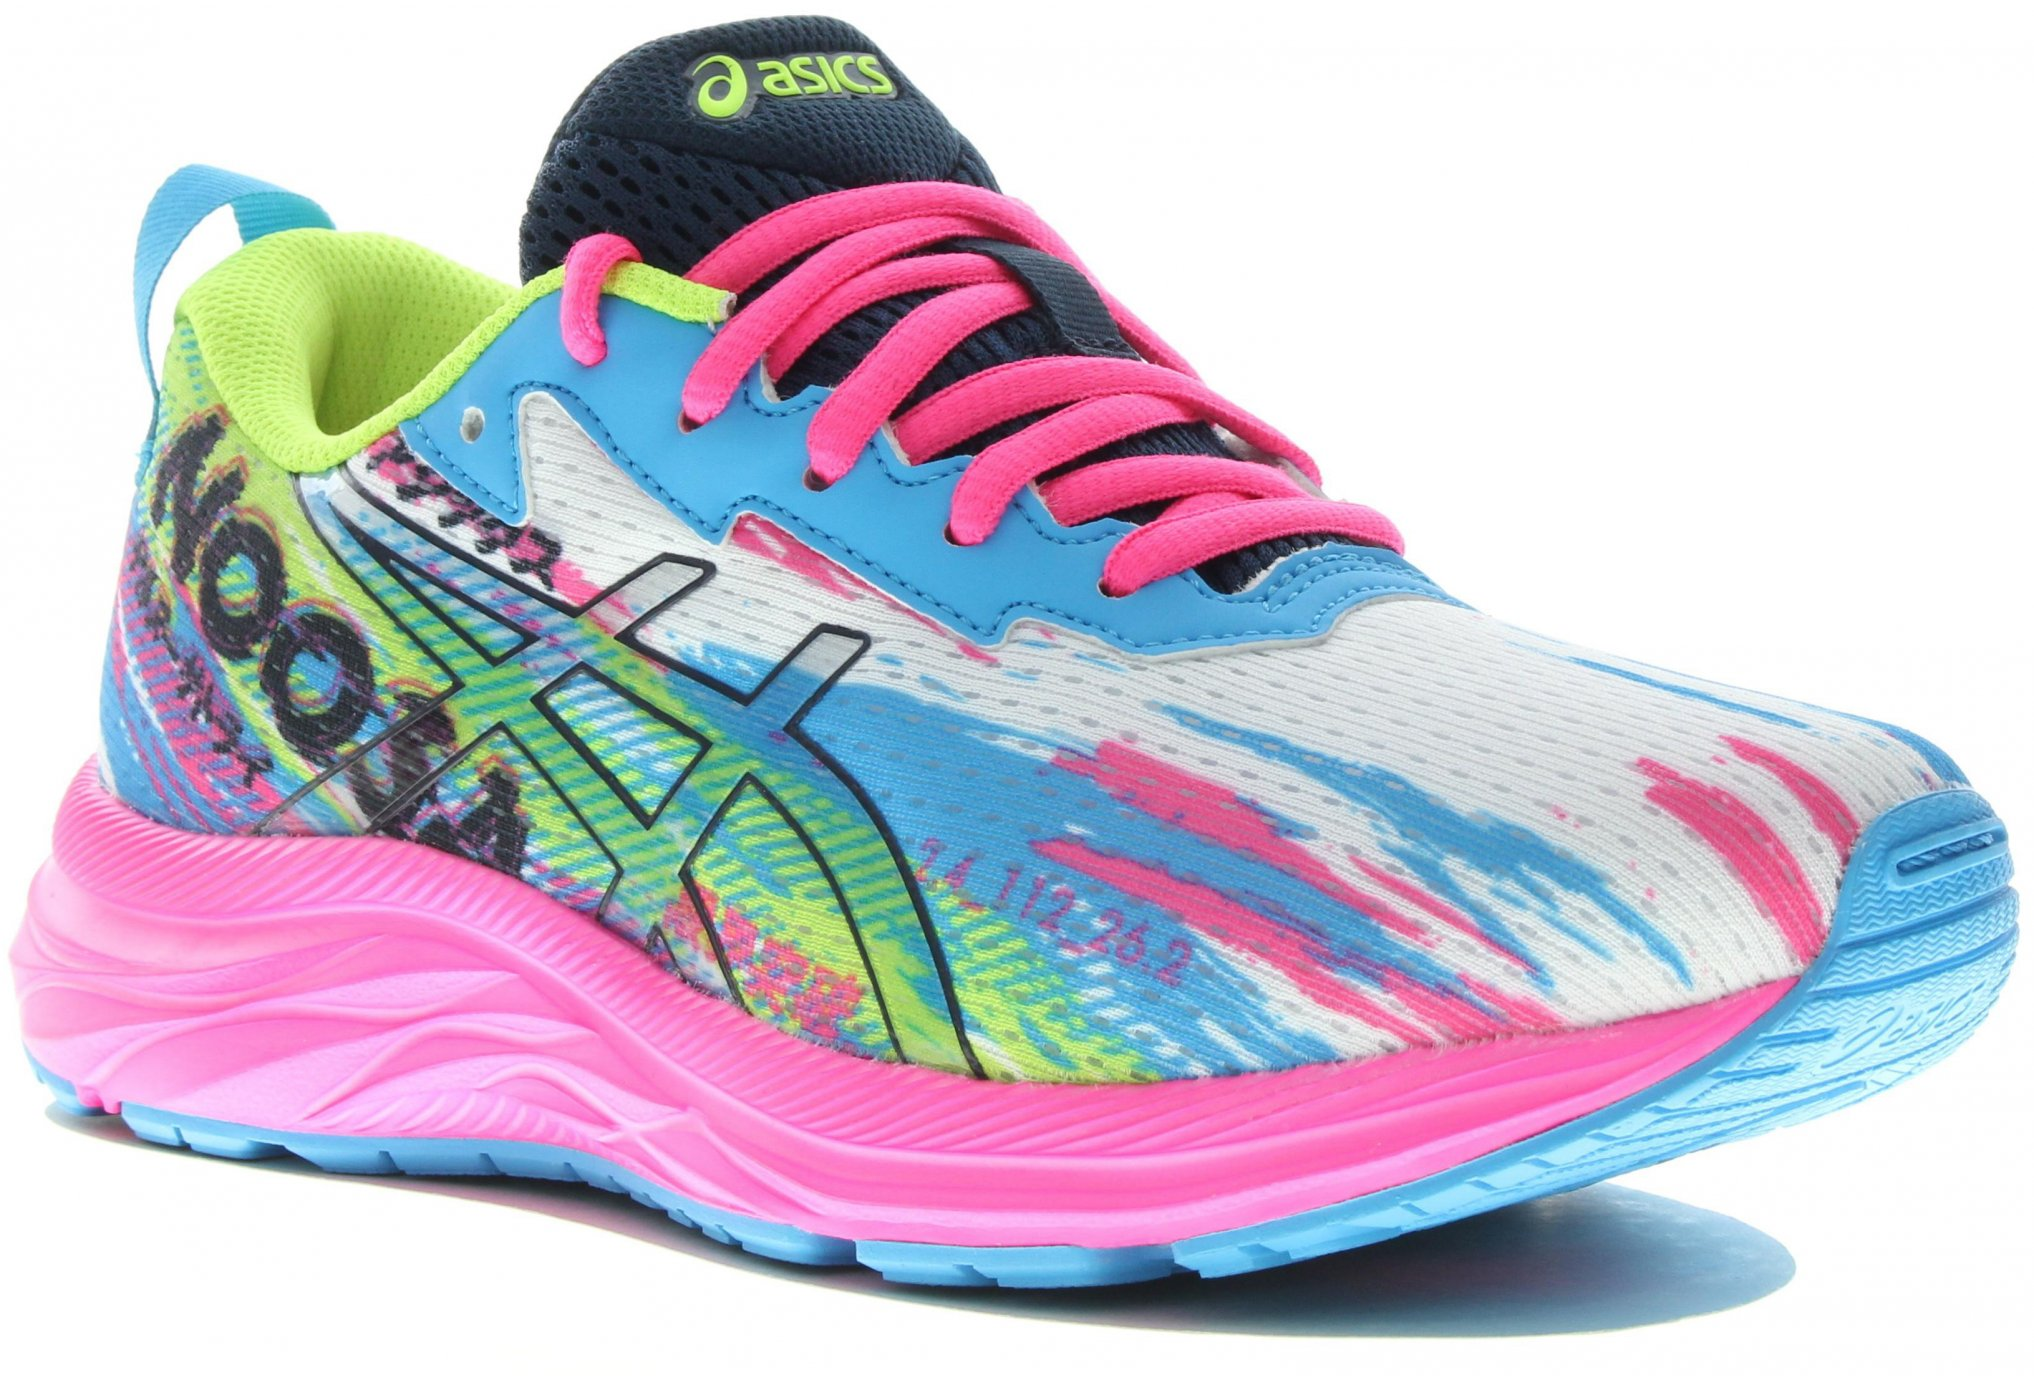 Asics Gel-Noosa Tri 13 Fille Chaussures running femme